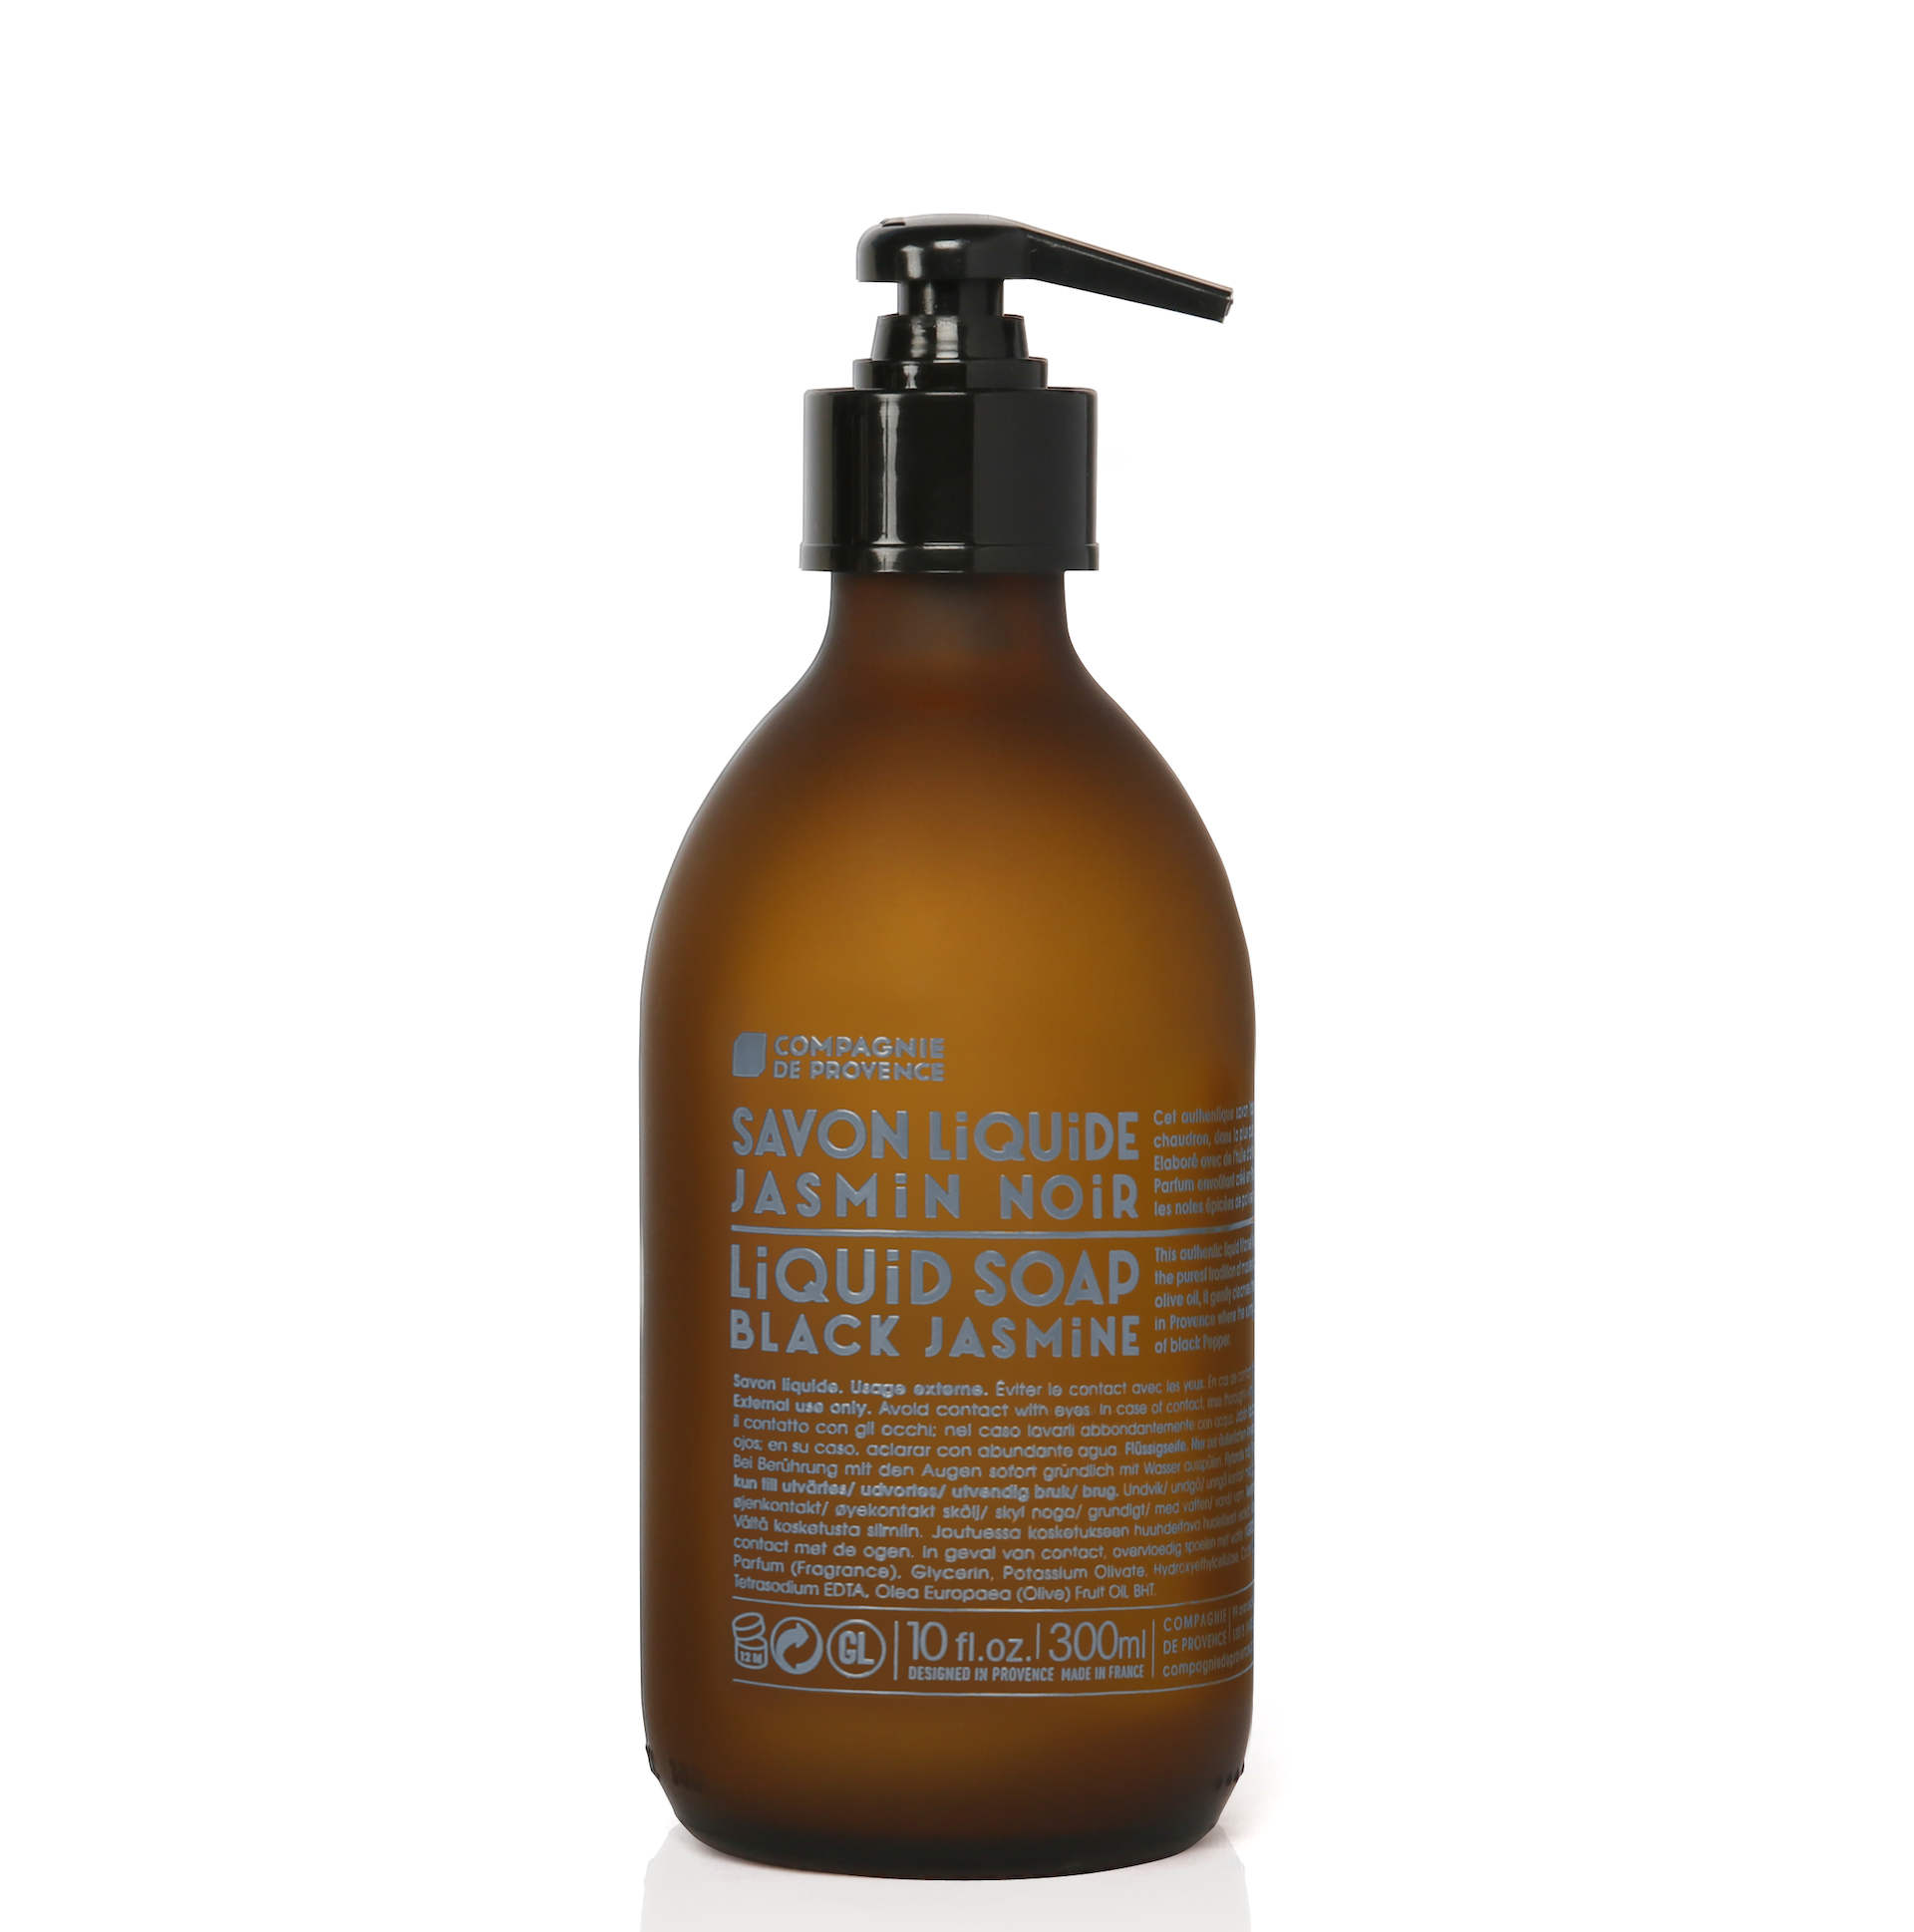 COMPAGNIE DE PROVENCE Tekuté mýdlo Jasmín 300ml, hnědá barva, sklo